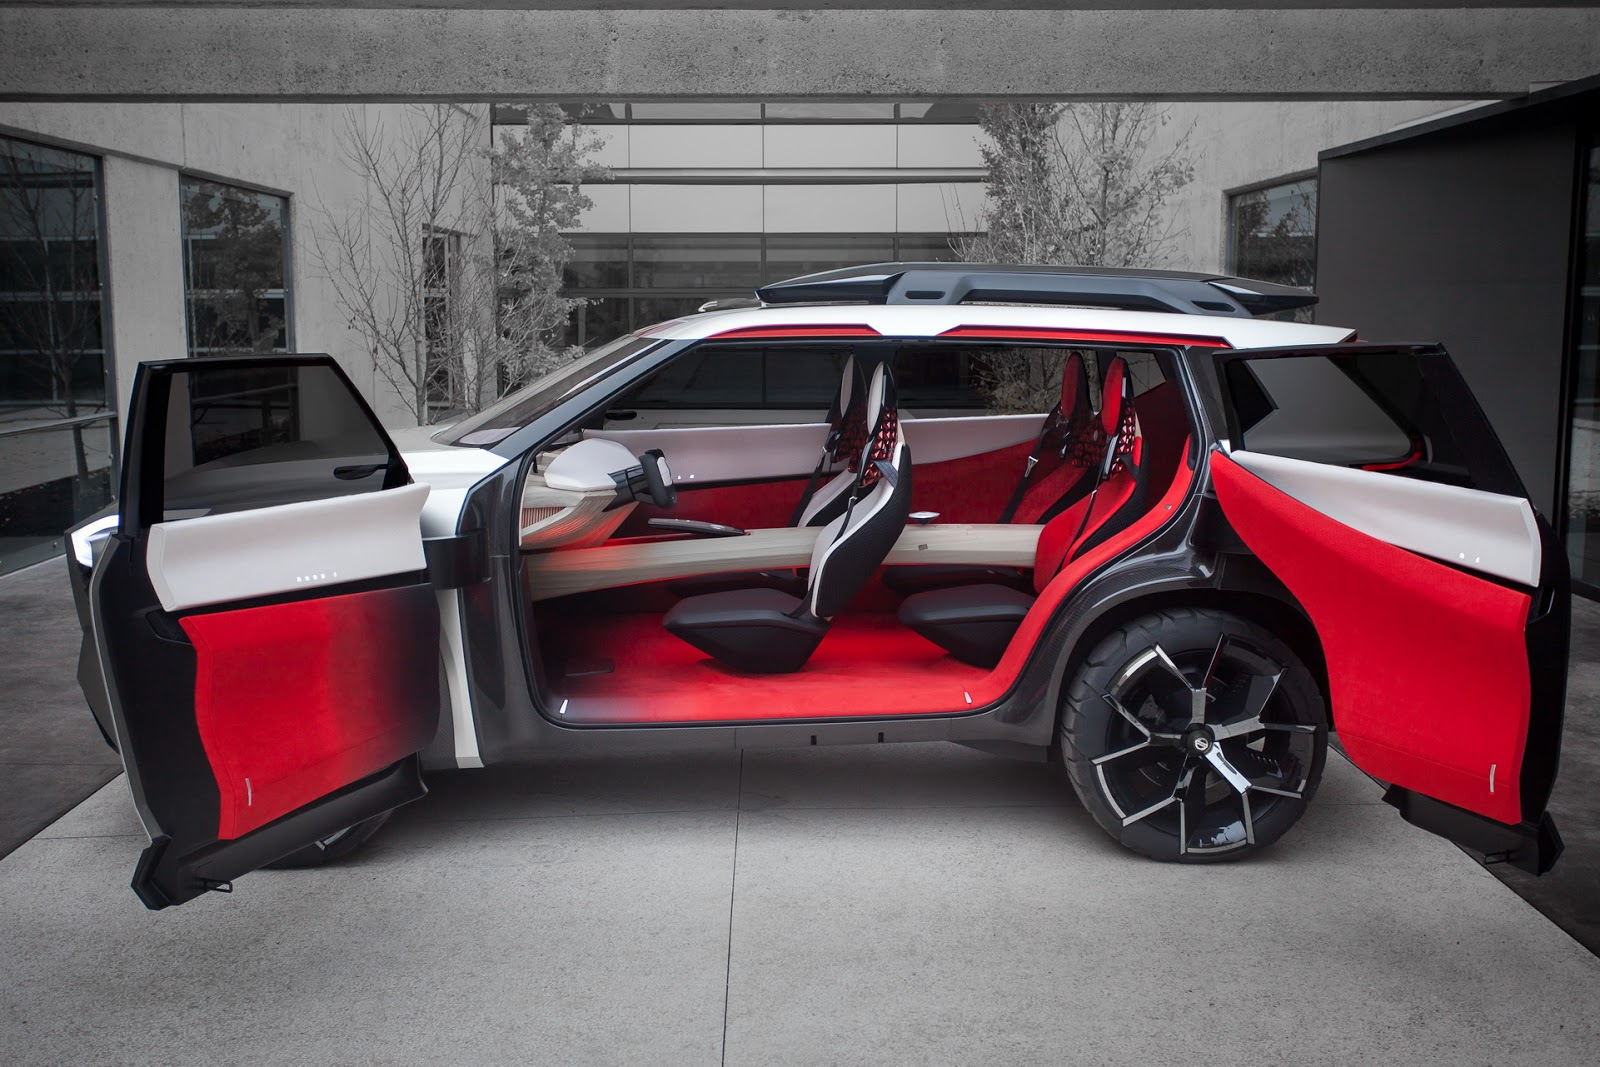 Nissan-Xmotion-Concept-243.jpg